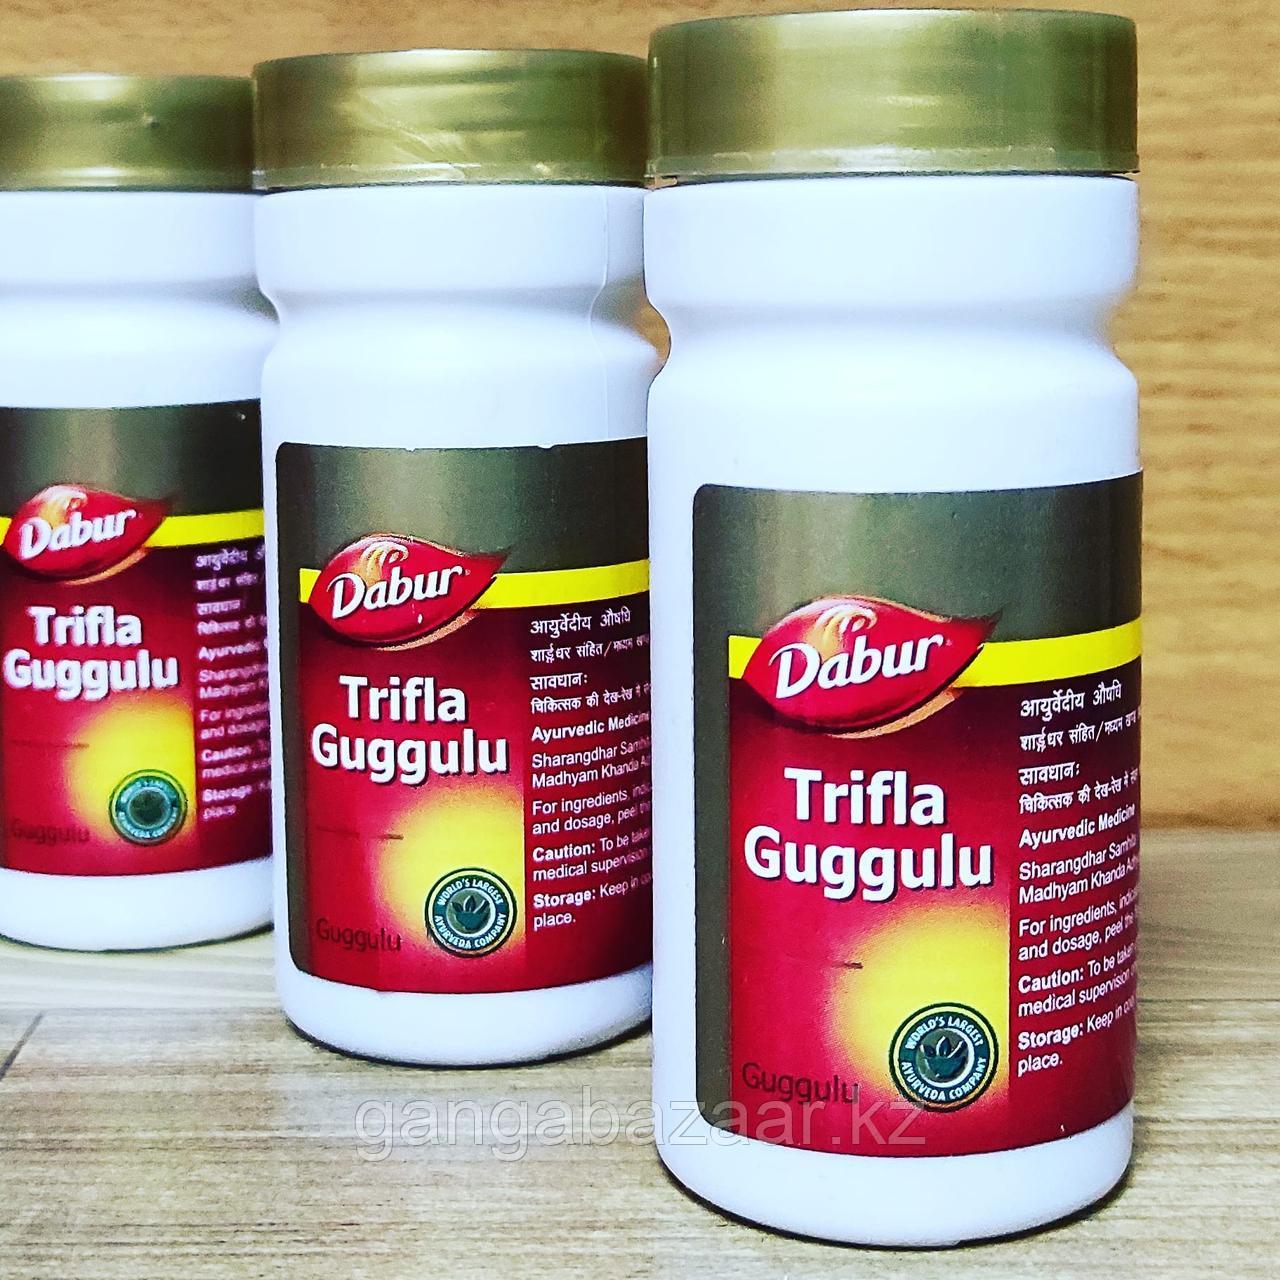 Трифала Гуггул Дабур (Trifla Guggulu DABUR) - очищение организма , 80 таб